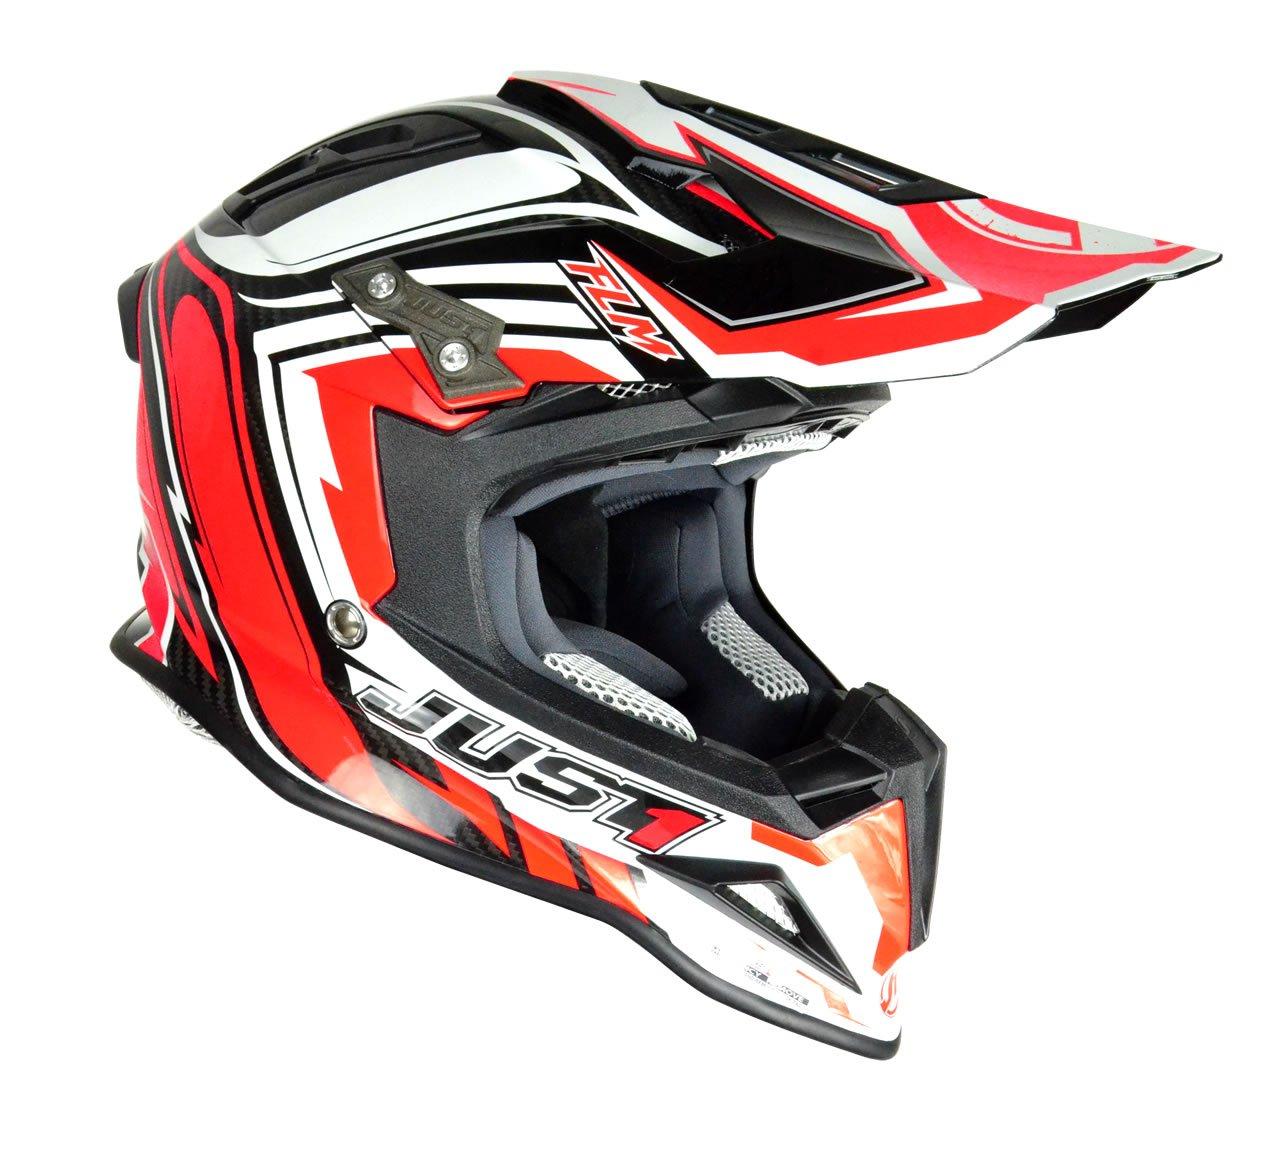 Just 1 Helmets J12 Casco de Motocross, Negro/Naranja, S: Amazon.es: Coche y moto